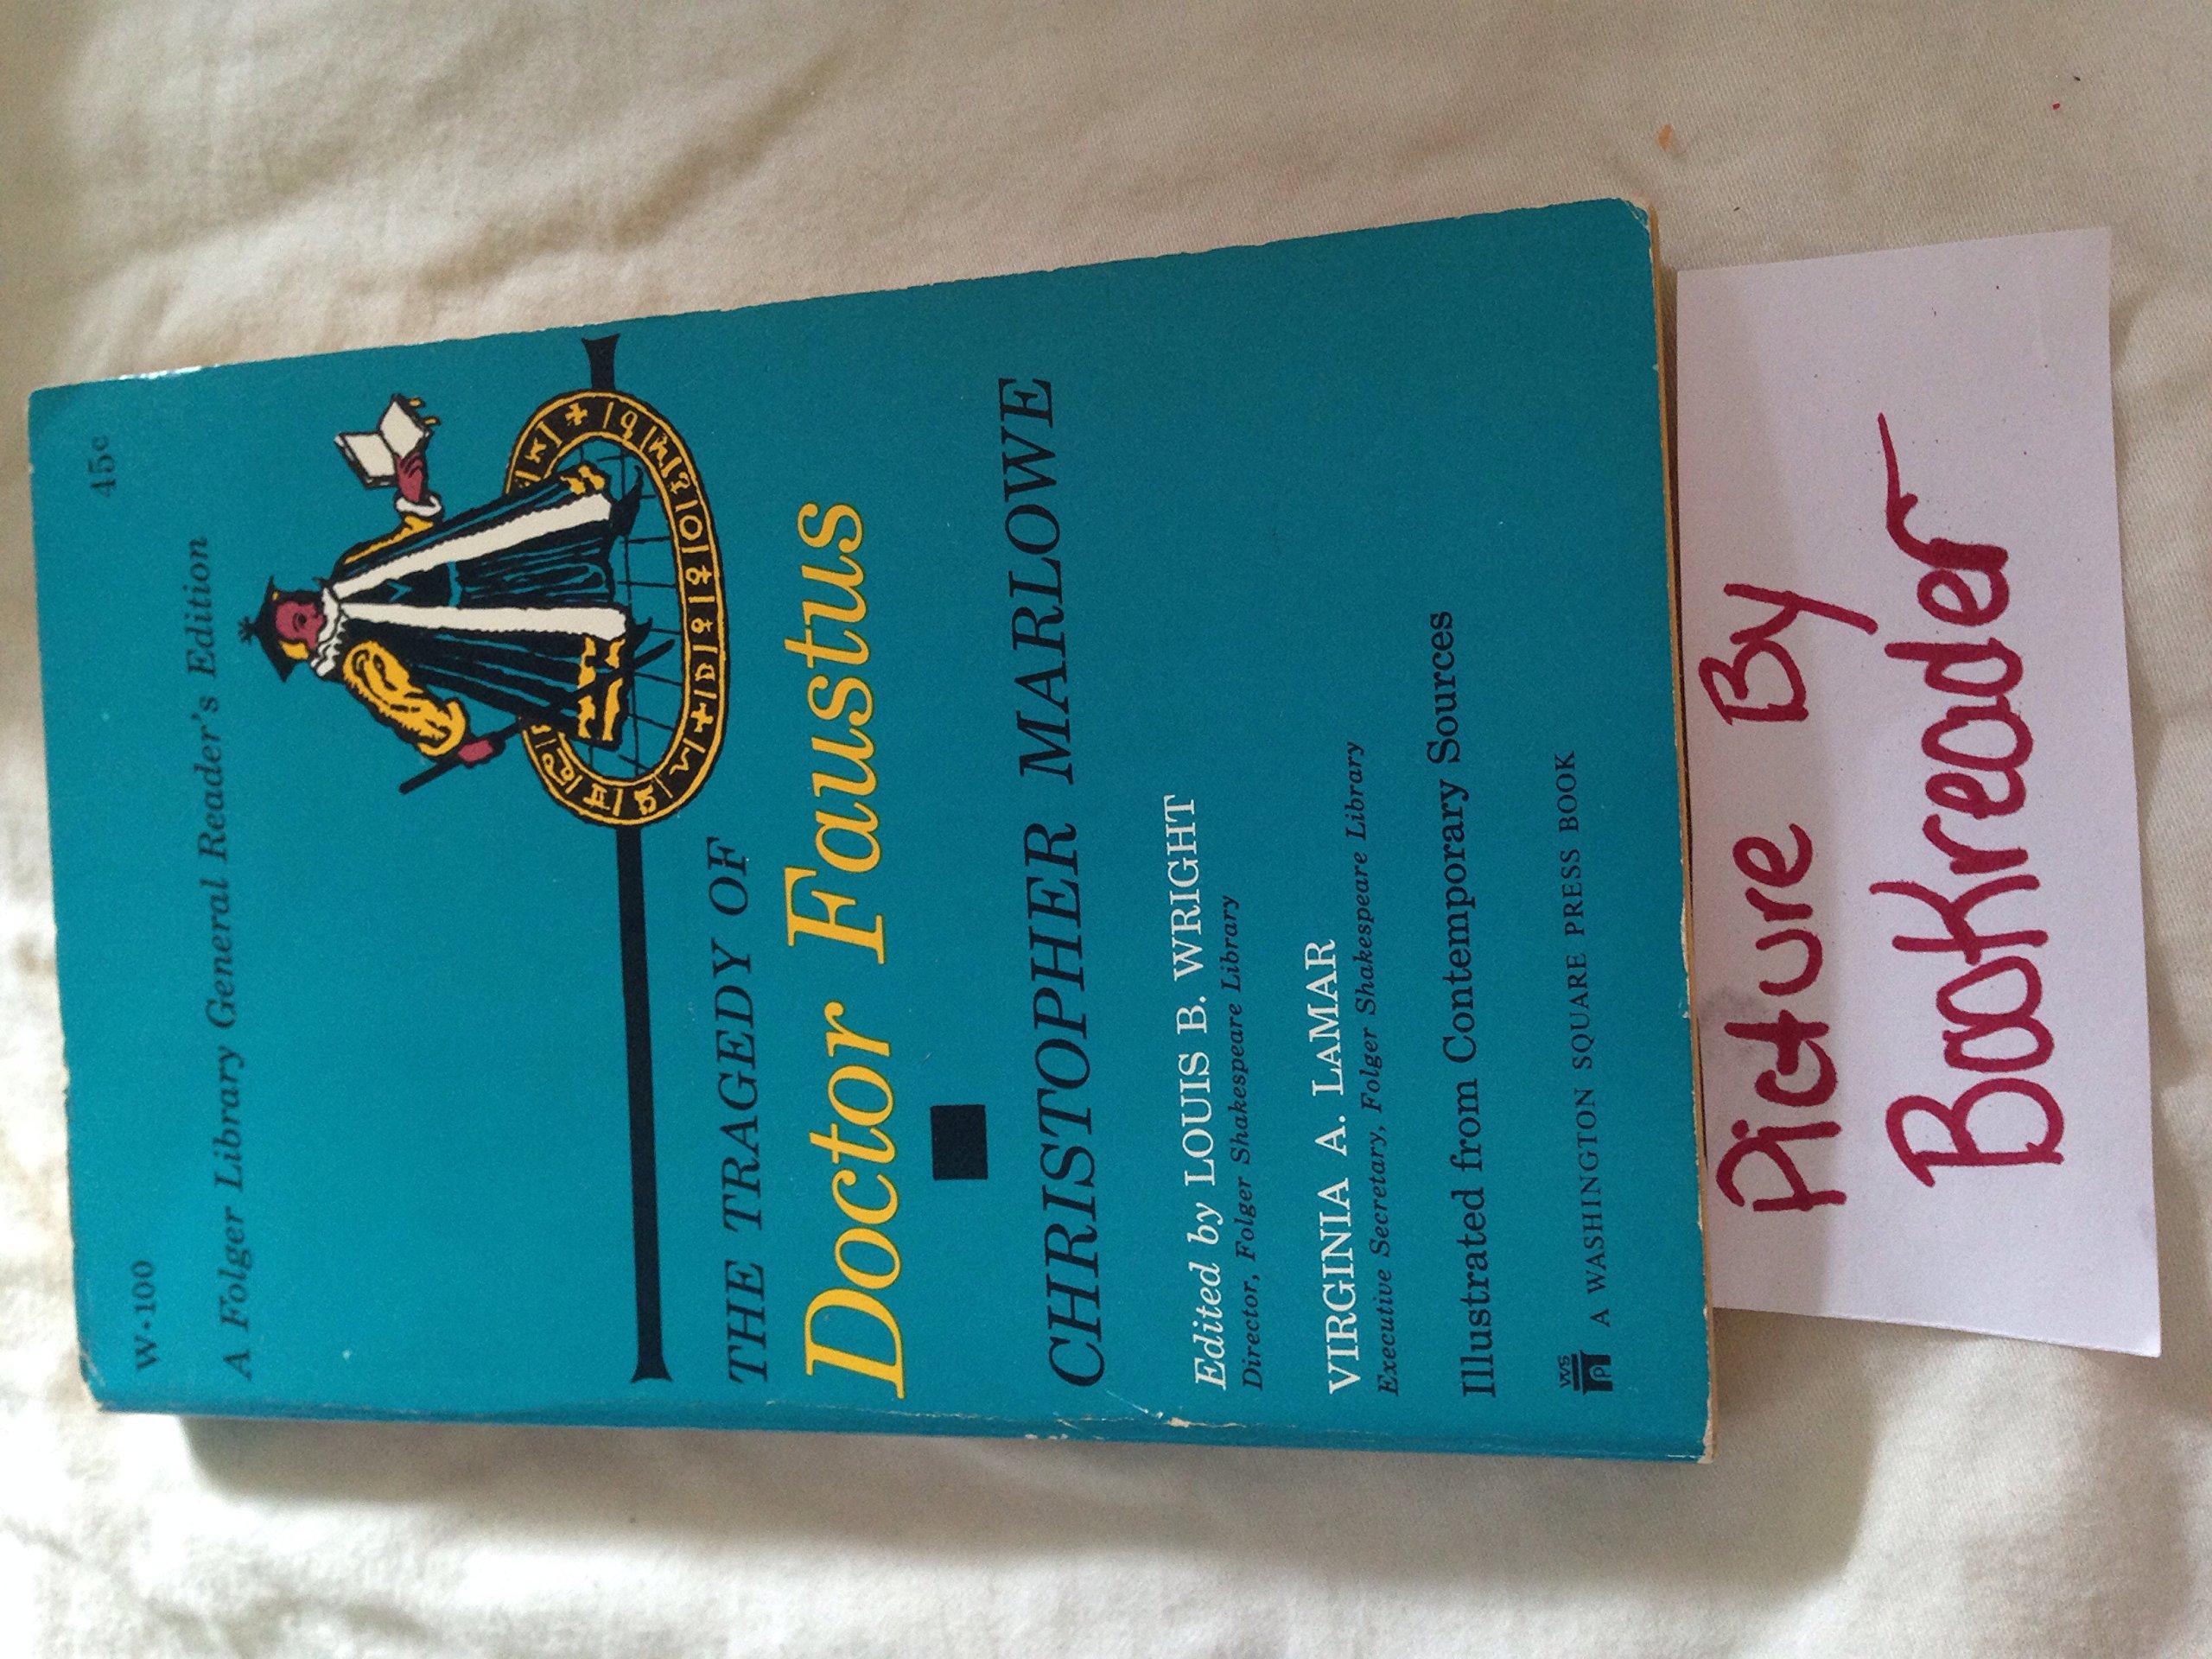 doctor faustus paperback jan 01 1964 marlowe christopher